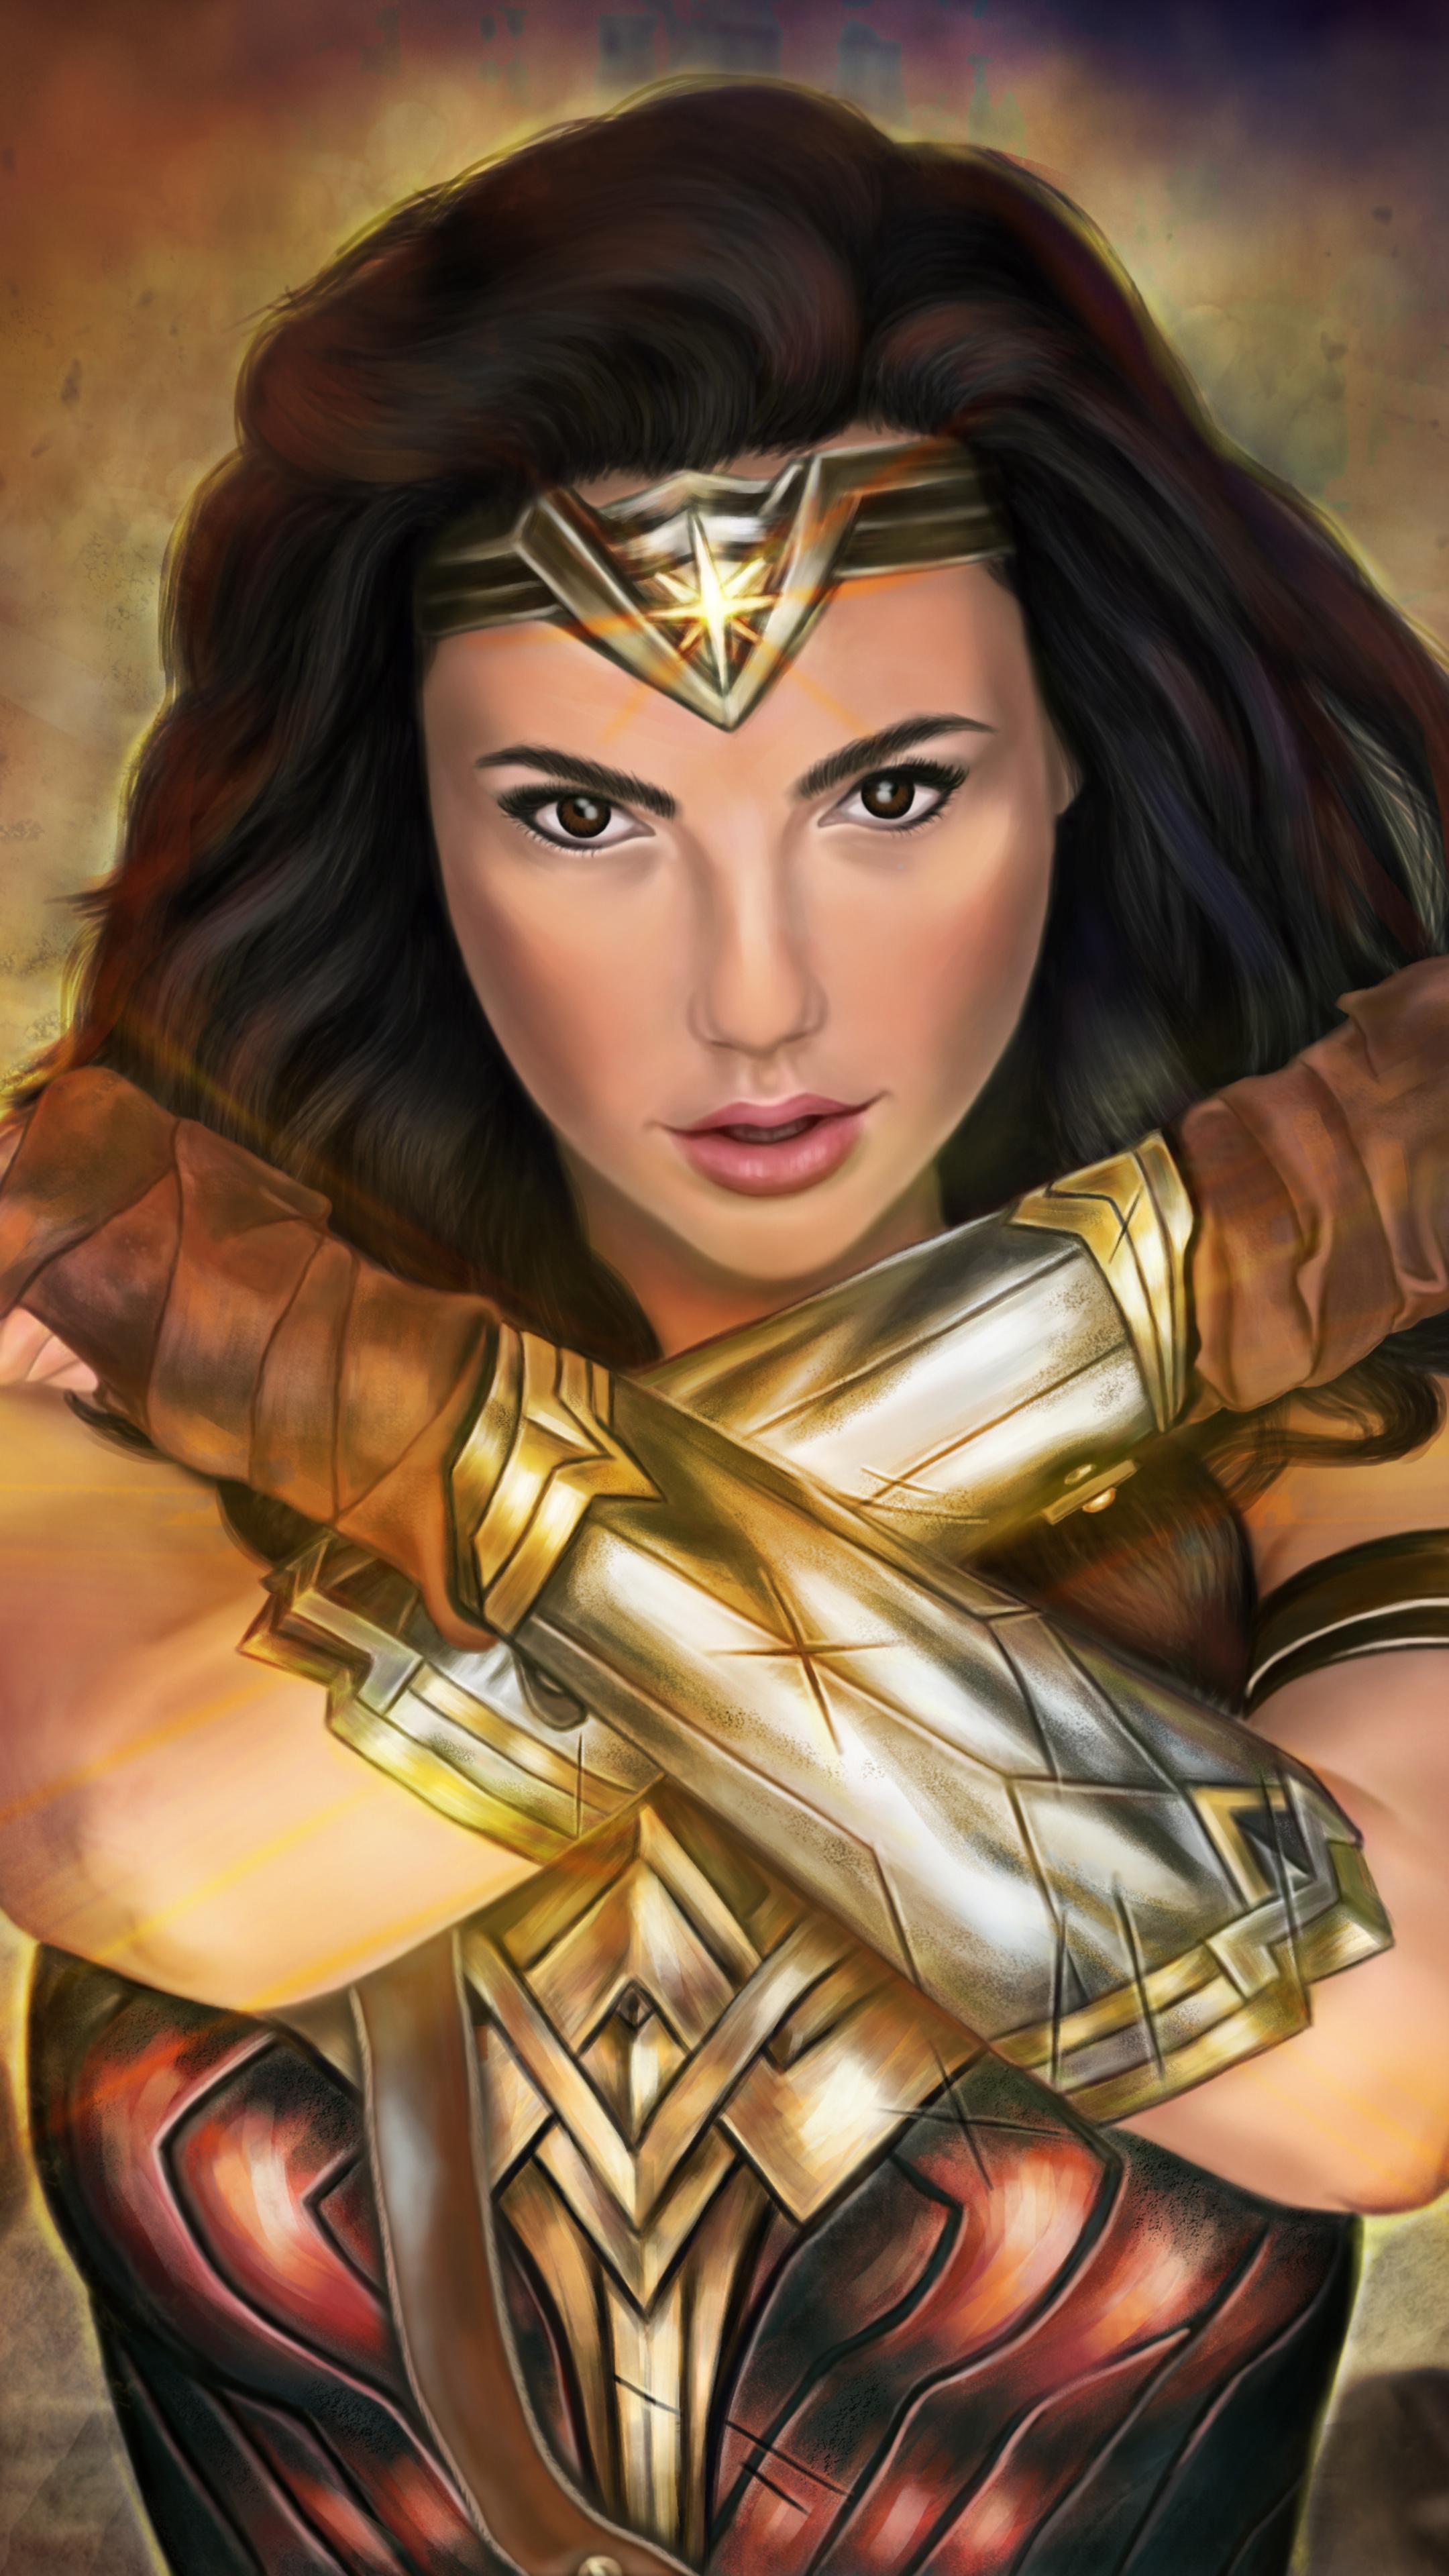 wonder-woman-justice-league-4k-art-75.jpg